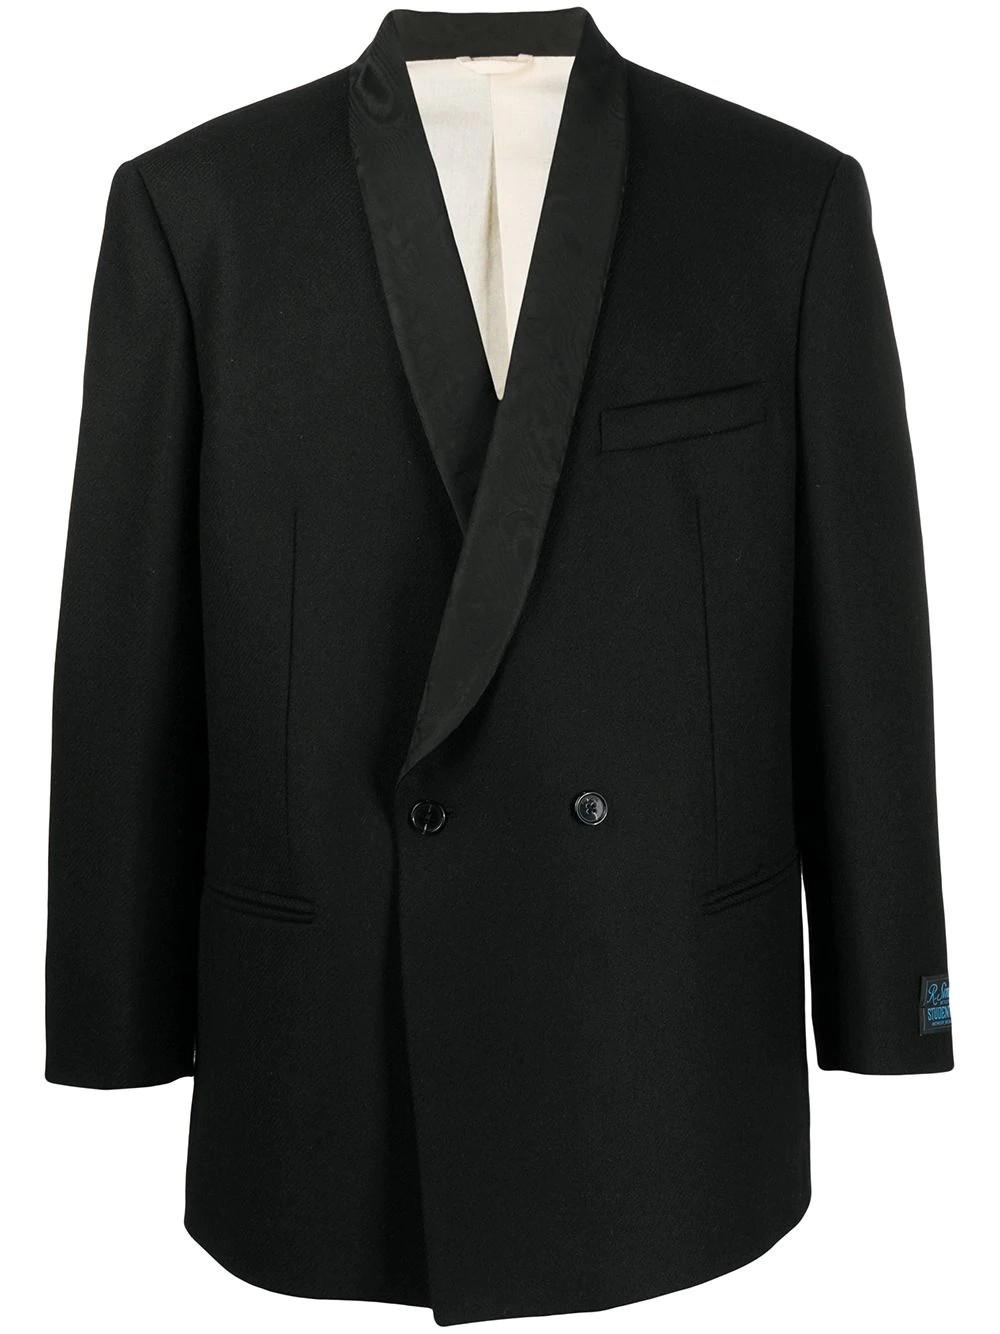 Boxy smoking blazer